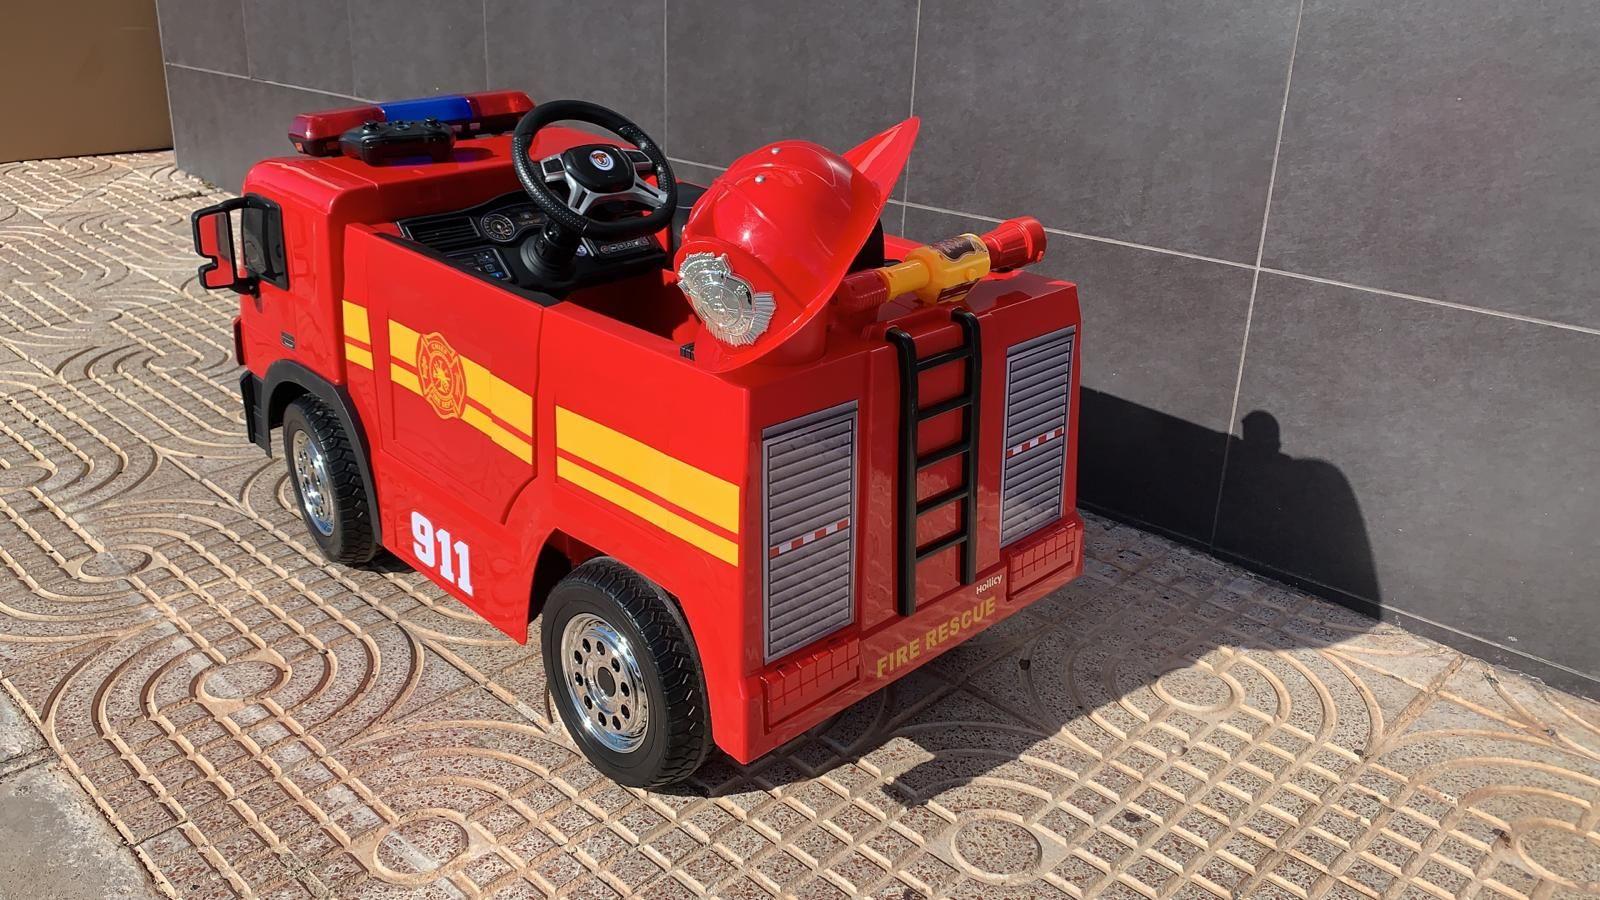 Camión De Bomberos 12 Voltios Infantil Rc Con Accesorios Incluidos En 2020 Camion De Bomberos Coche Para Niños Bomberos